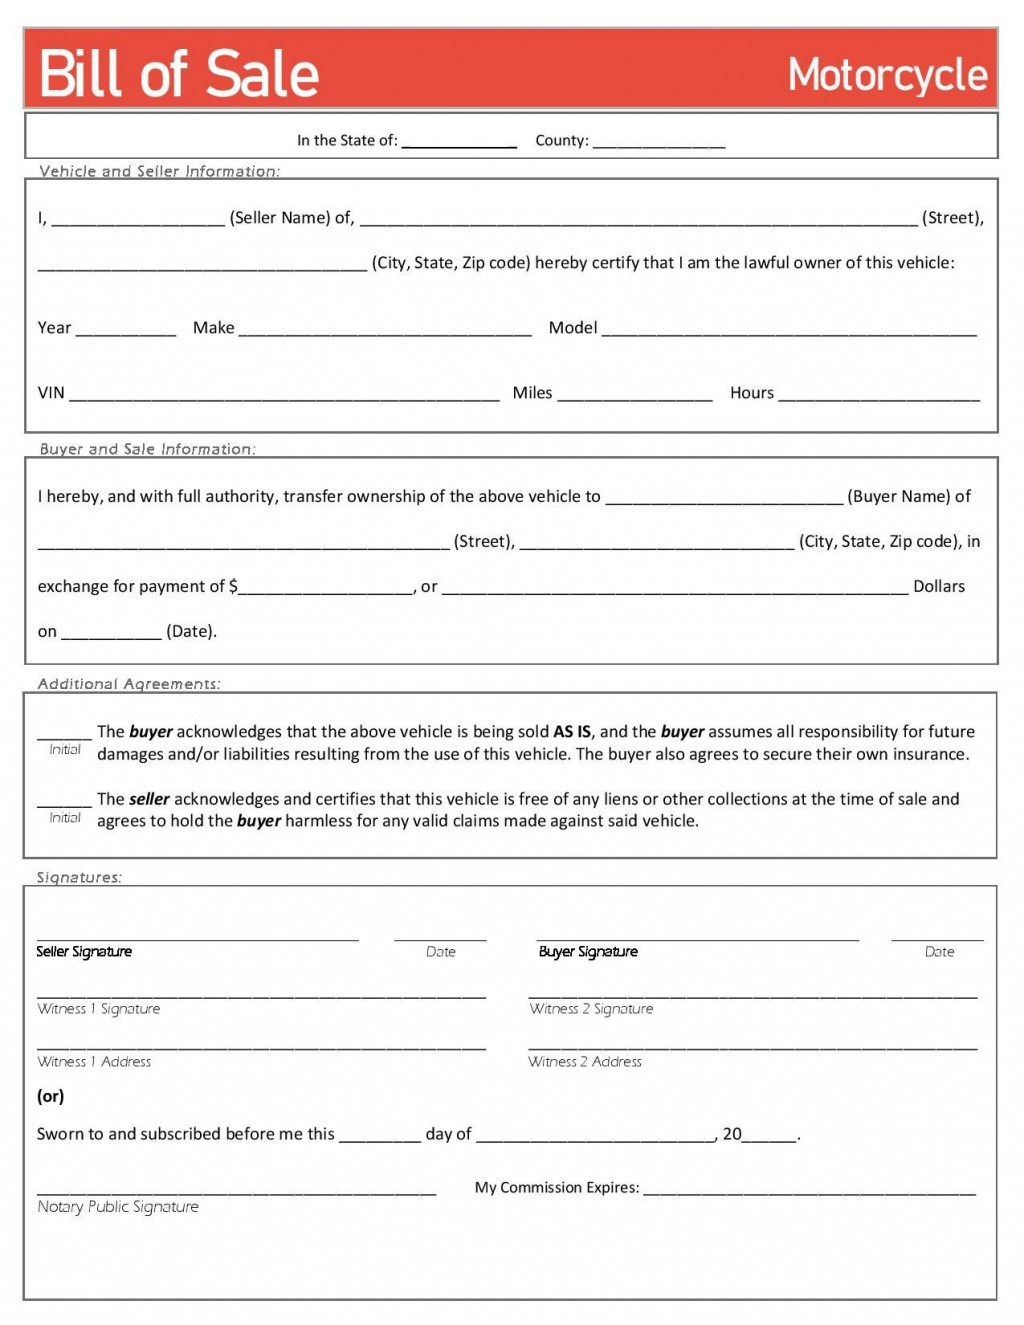 002 Sensational Bill Of Sale Template Texa Highest Quality  Texas Free Car Form Dmv DocumentLarge